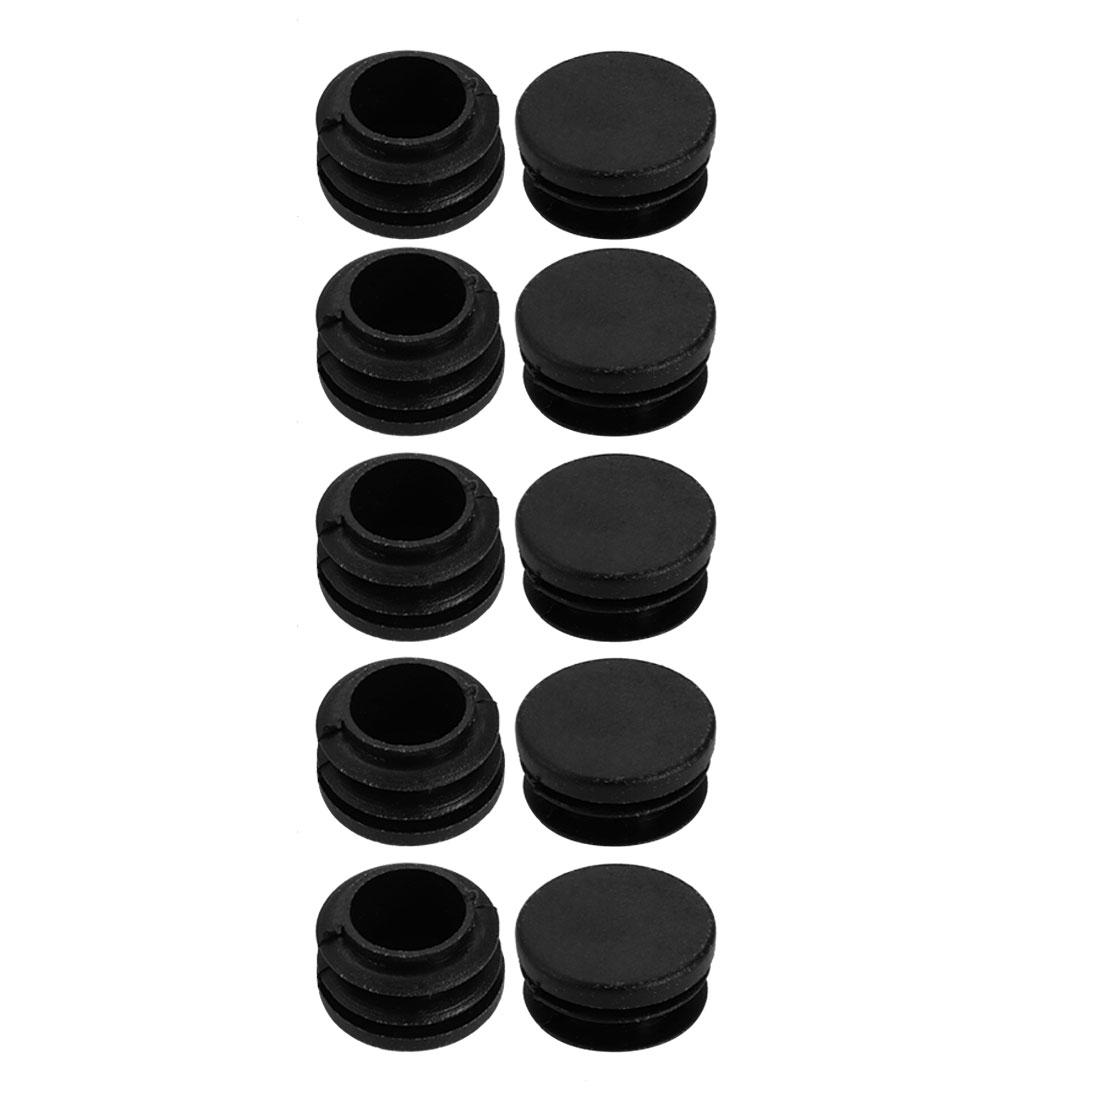 10pcs 30mm Dia Black Plastic Round Chair Leg Floor Insert Cover Protector